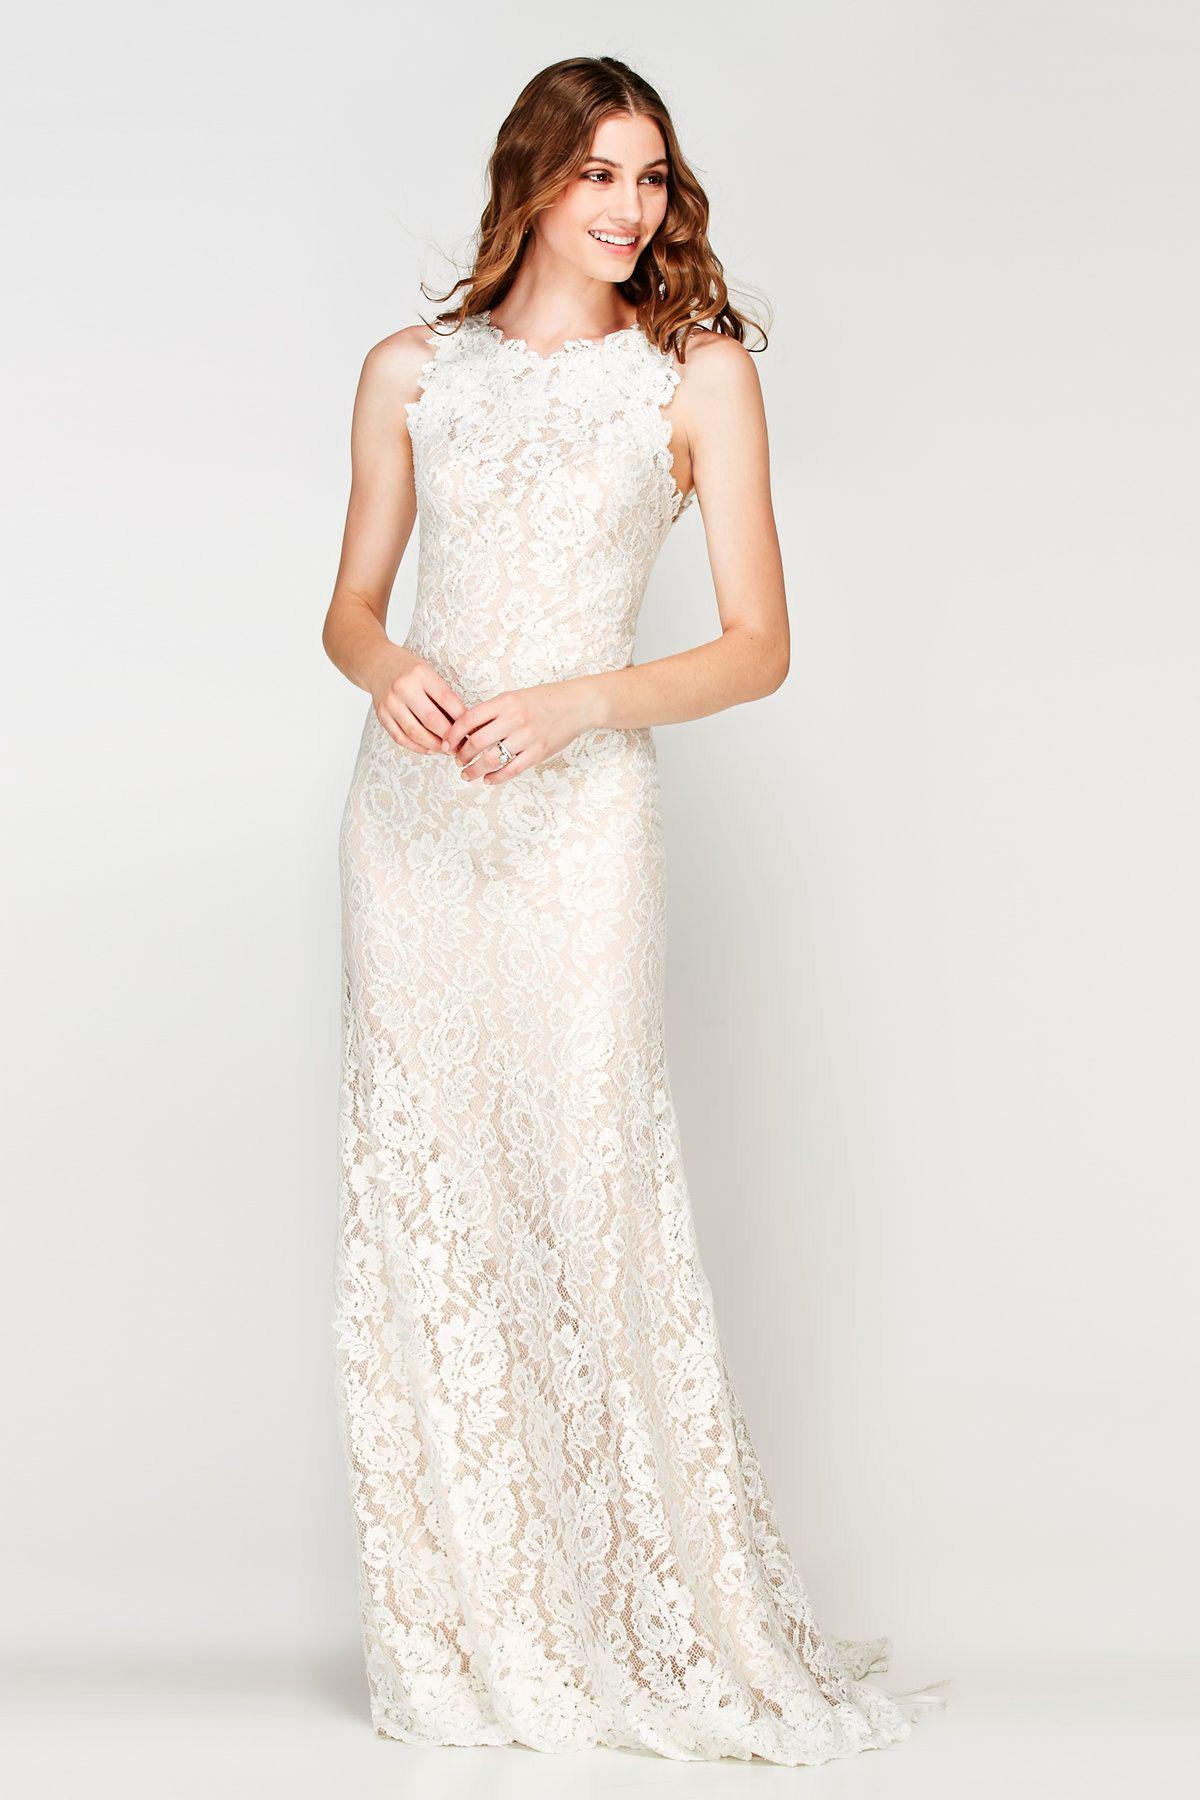 Willowby dress perth wedding pinterest perth wedding dress shop designer bridal gowns like the perth style 56148 dress by willowby and other bridal accessories at blush bridal ombrellifo Images